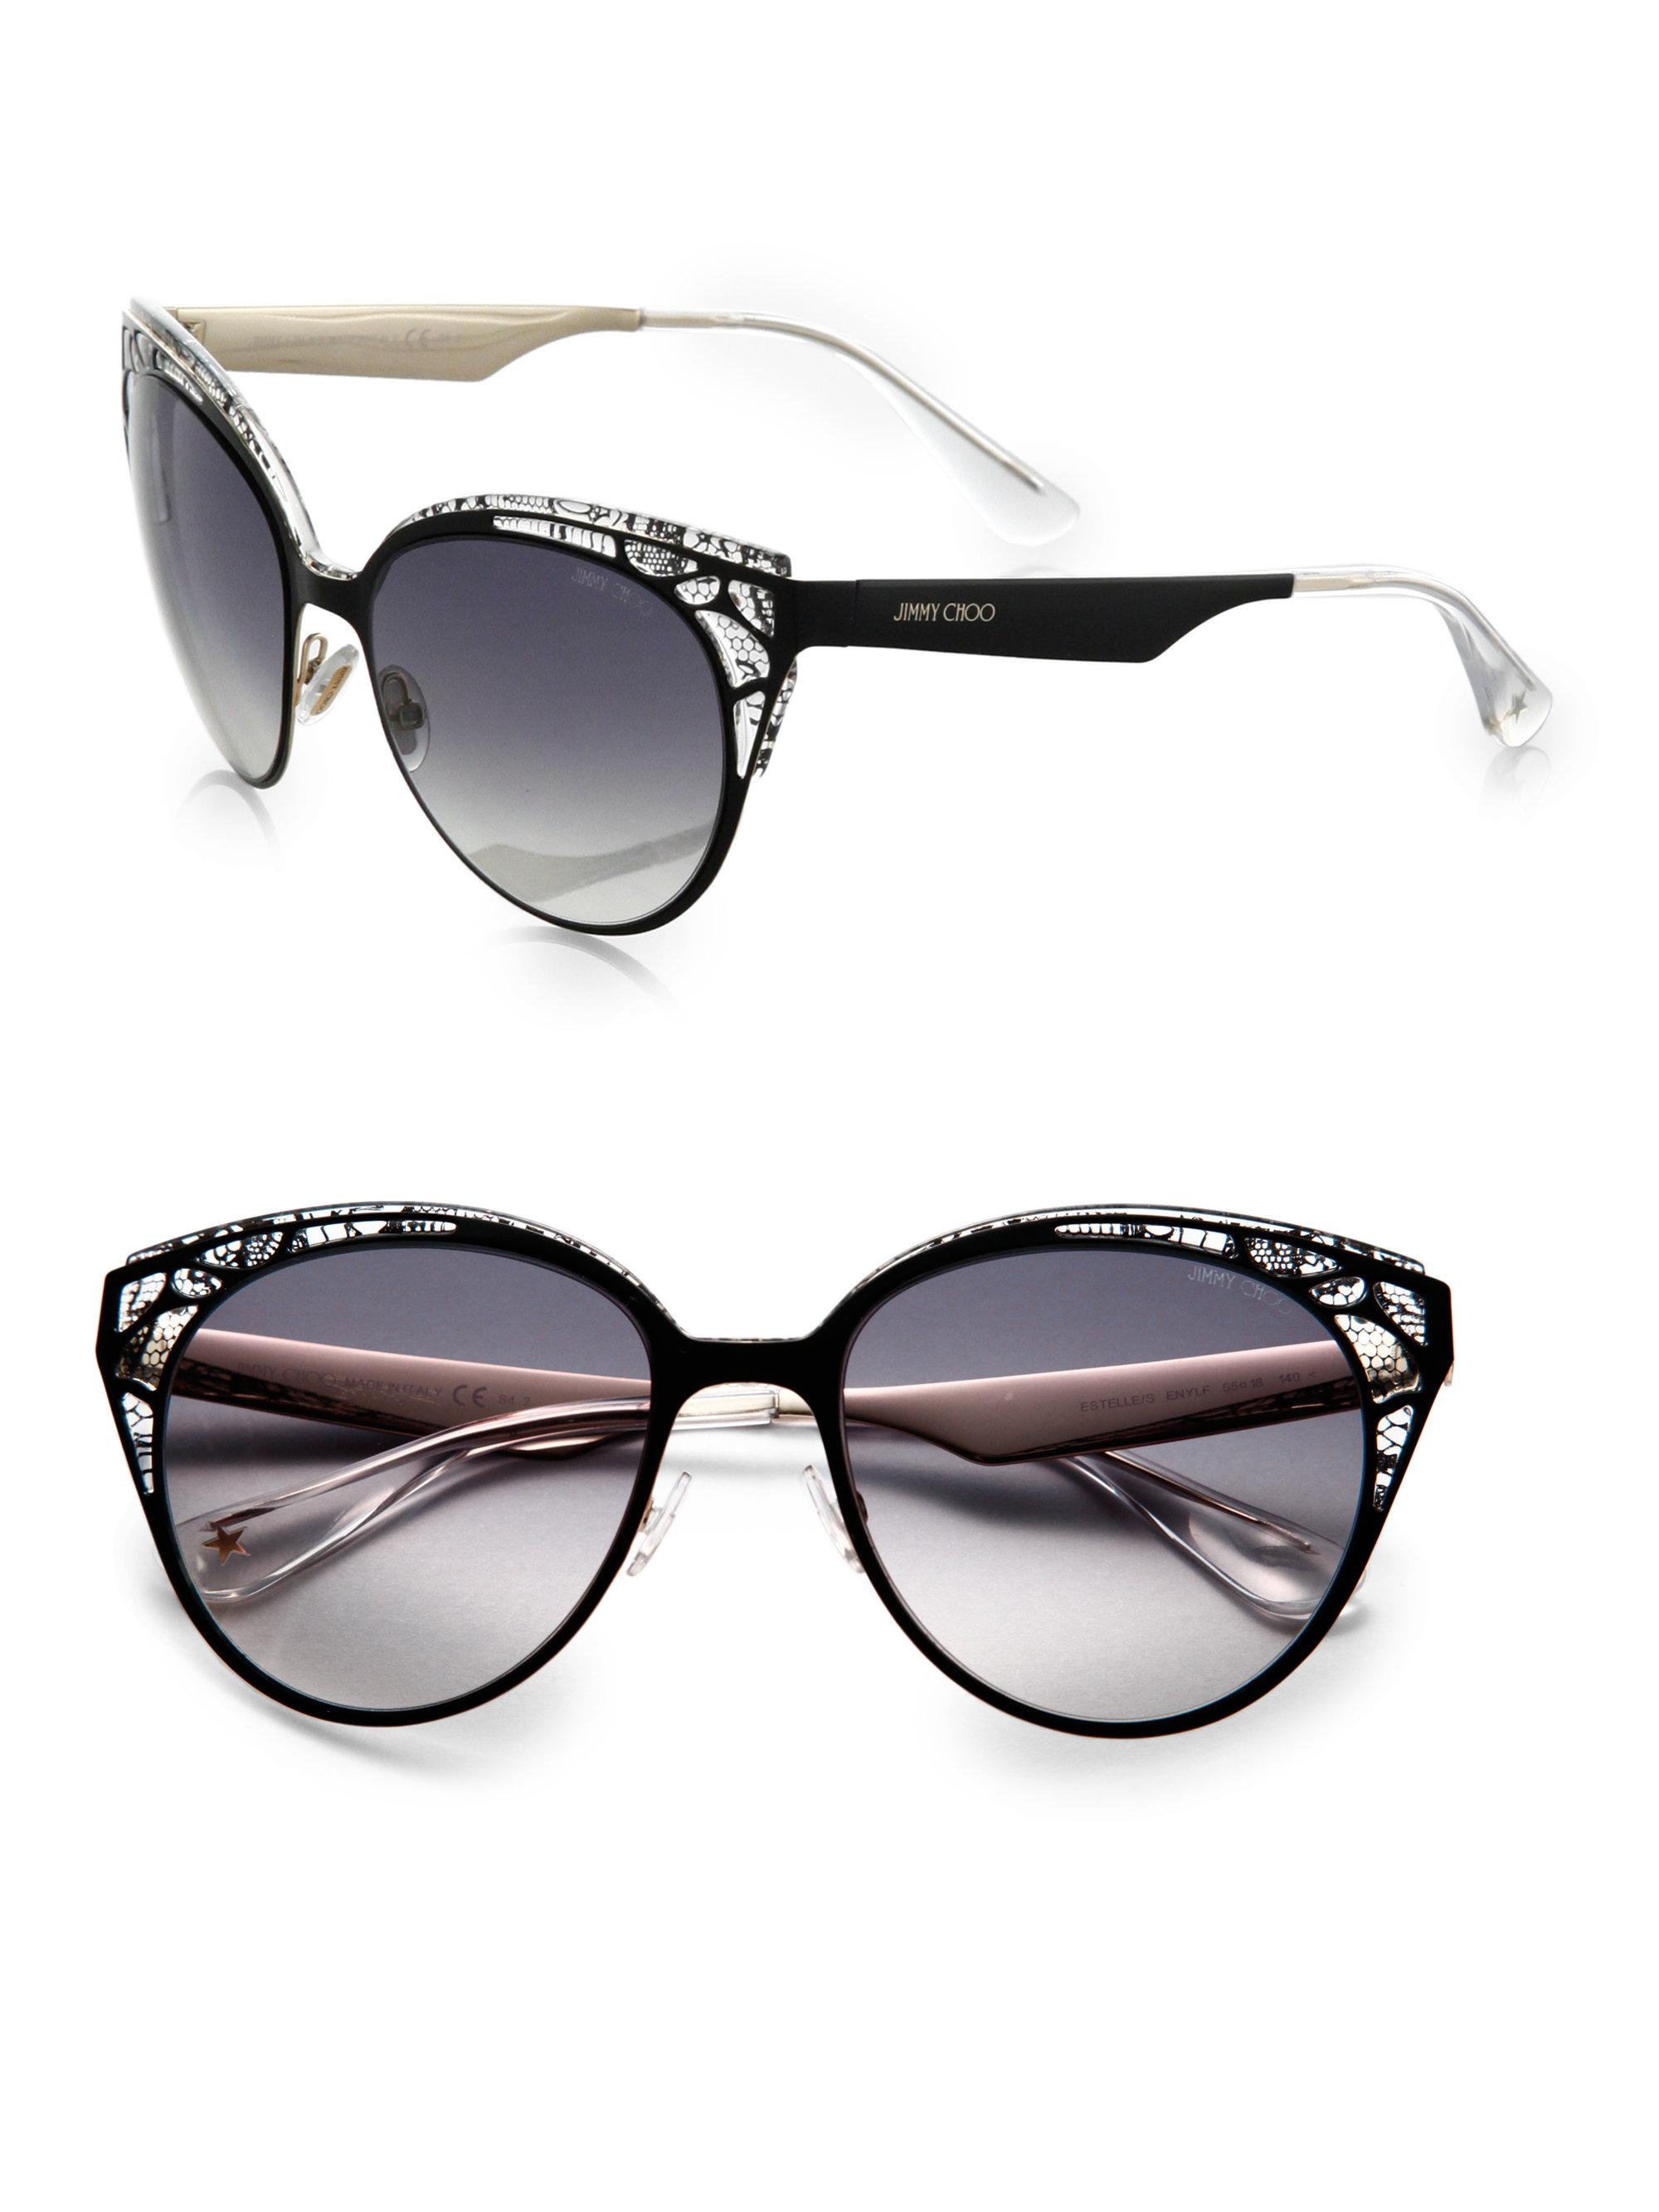 d14018cc8d2 Jimmy Choo Sunglasses Estelle « Heritage Malta